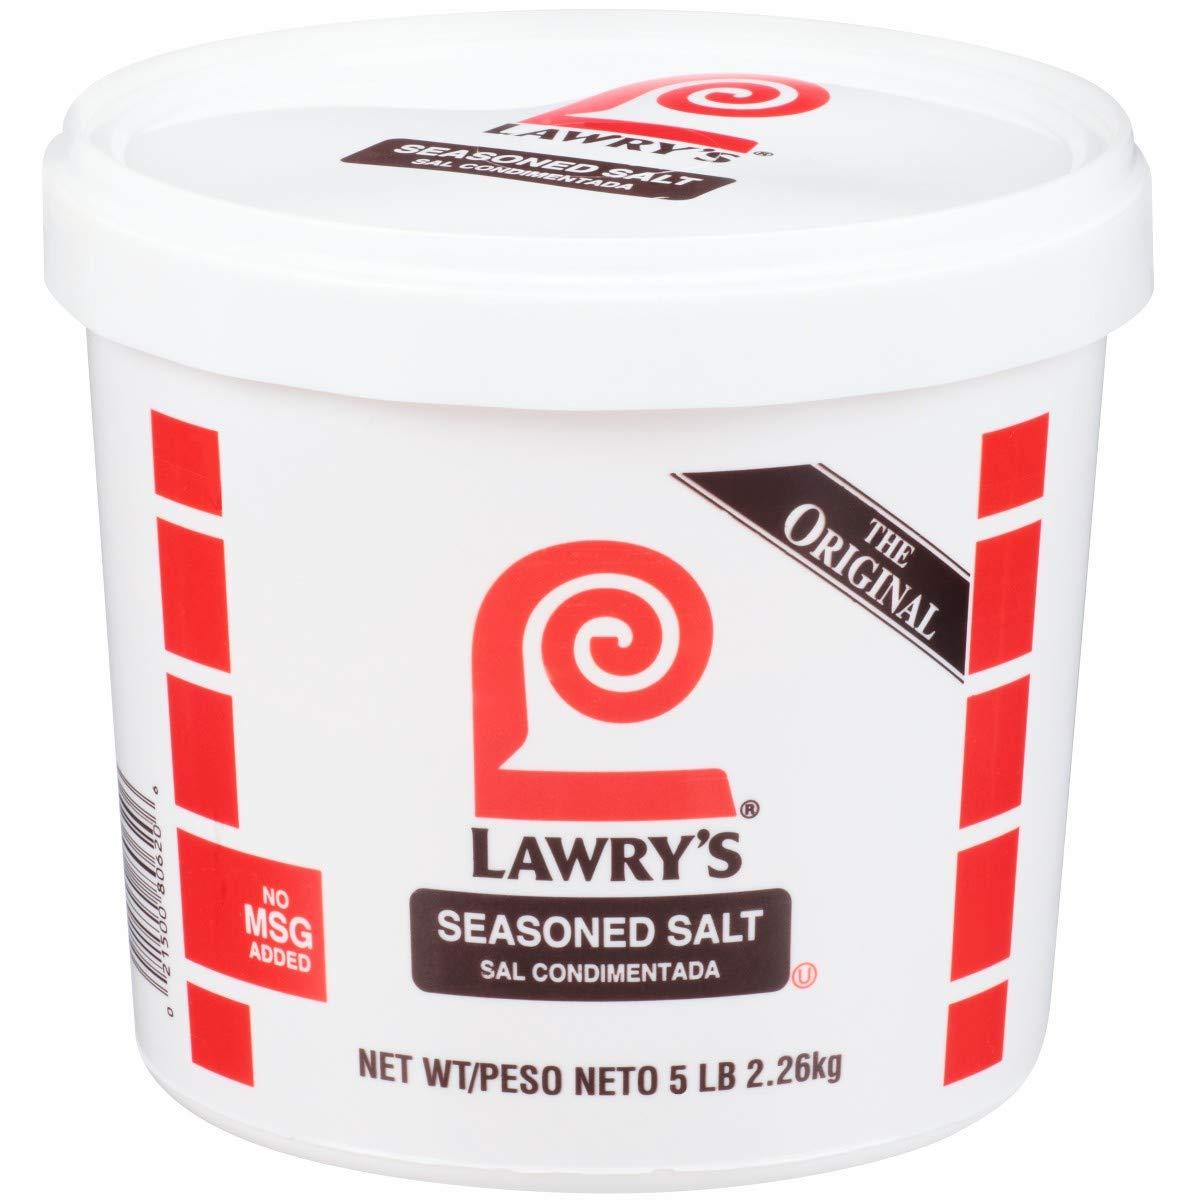 Lawrys Seasoned Salt - 5 lb. tub, 2 per case by McCormick